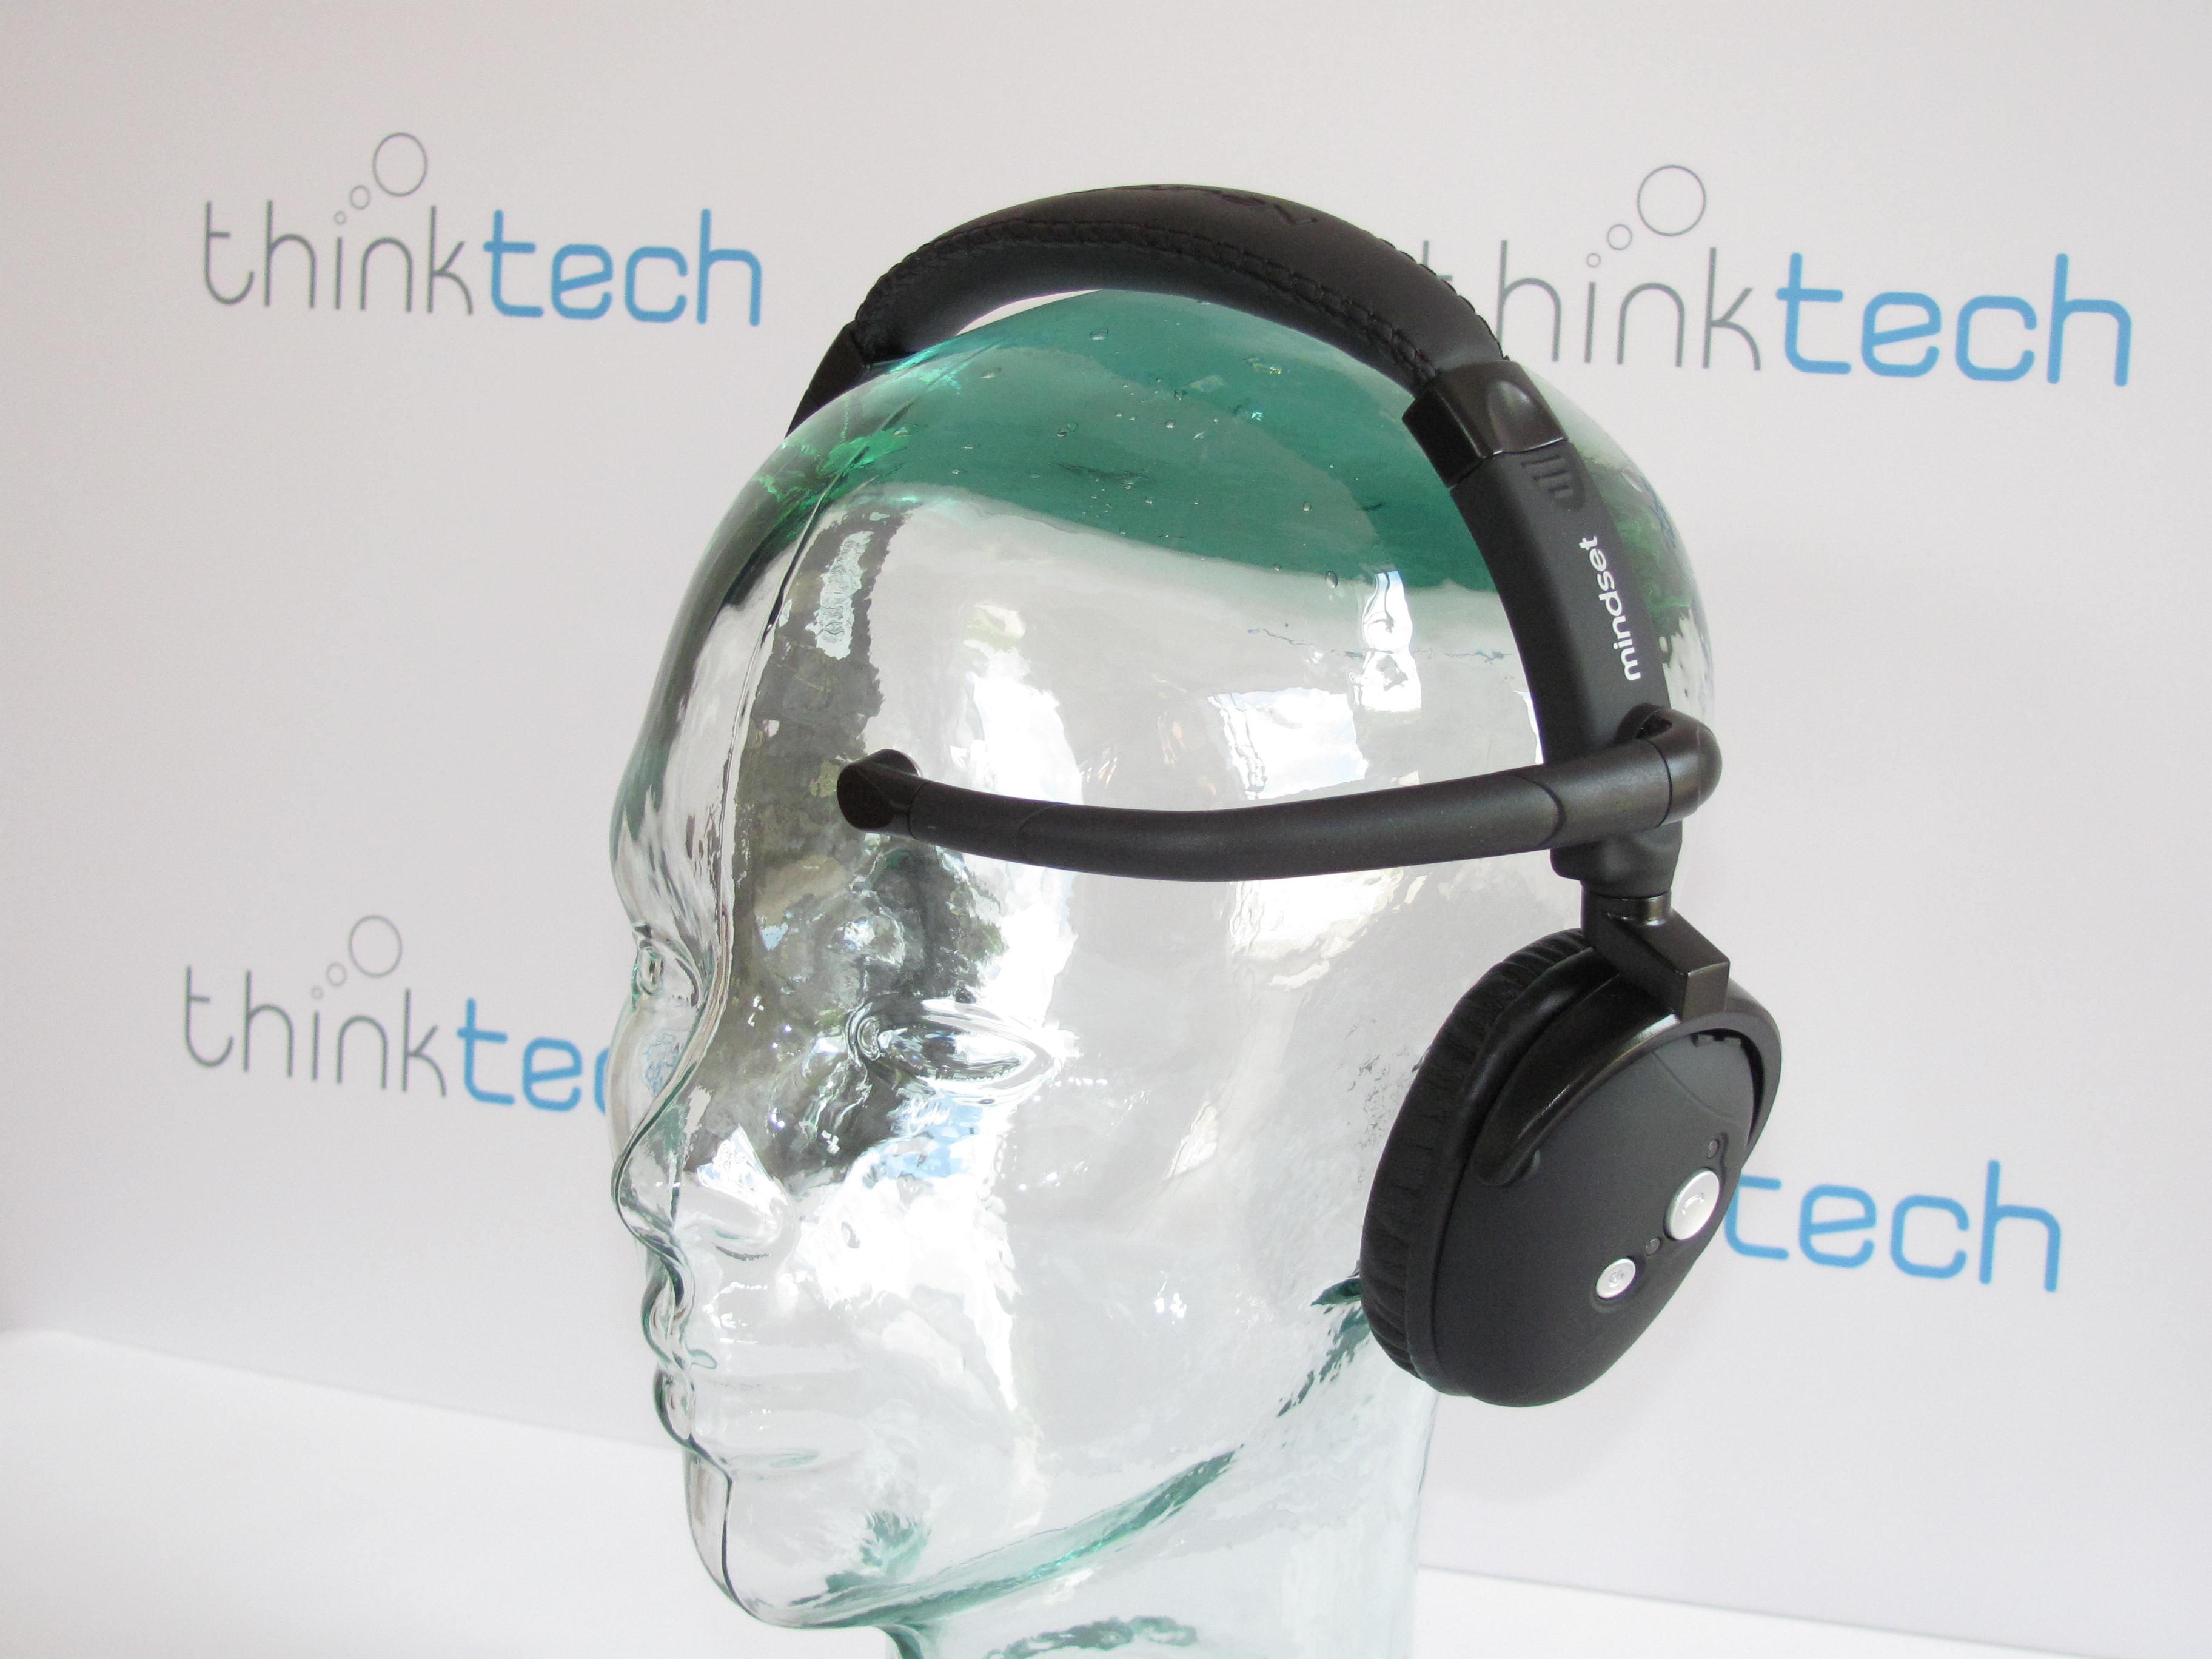 10 Really Insane Gadgets 8